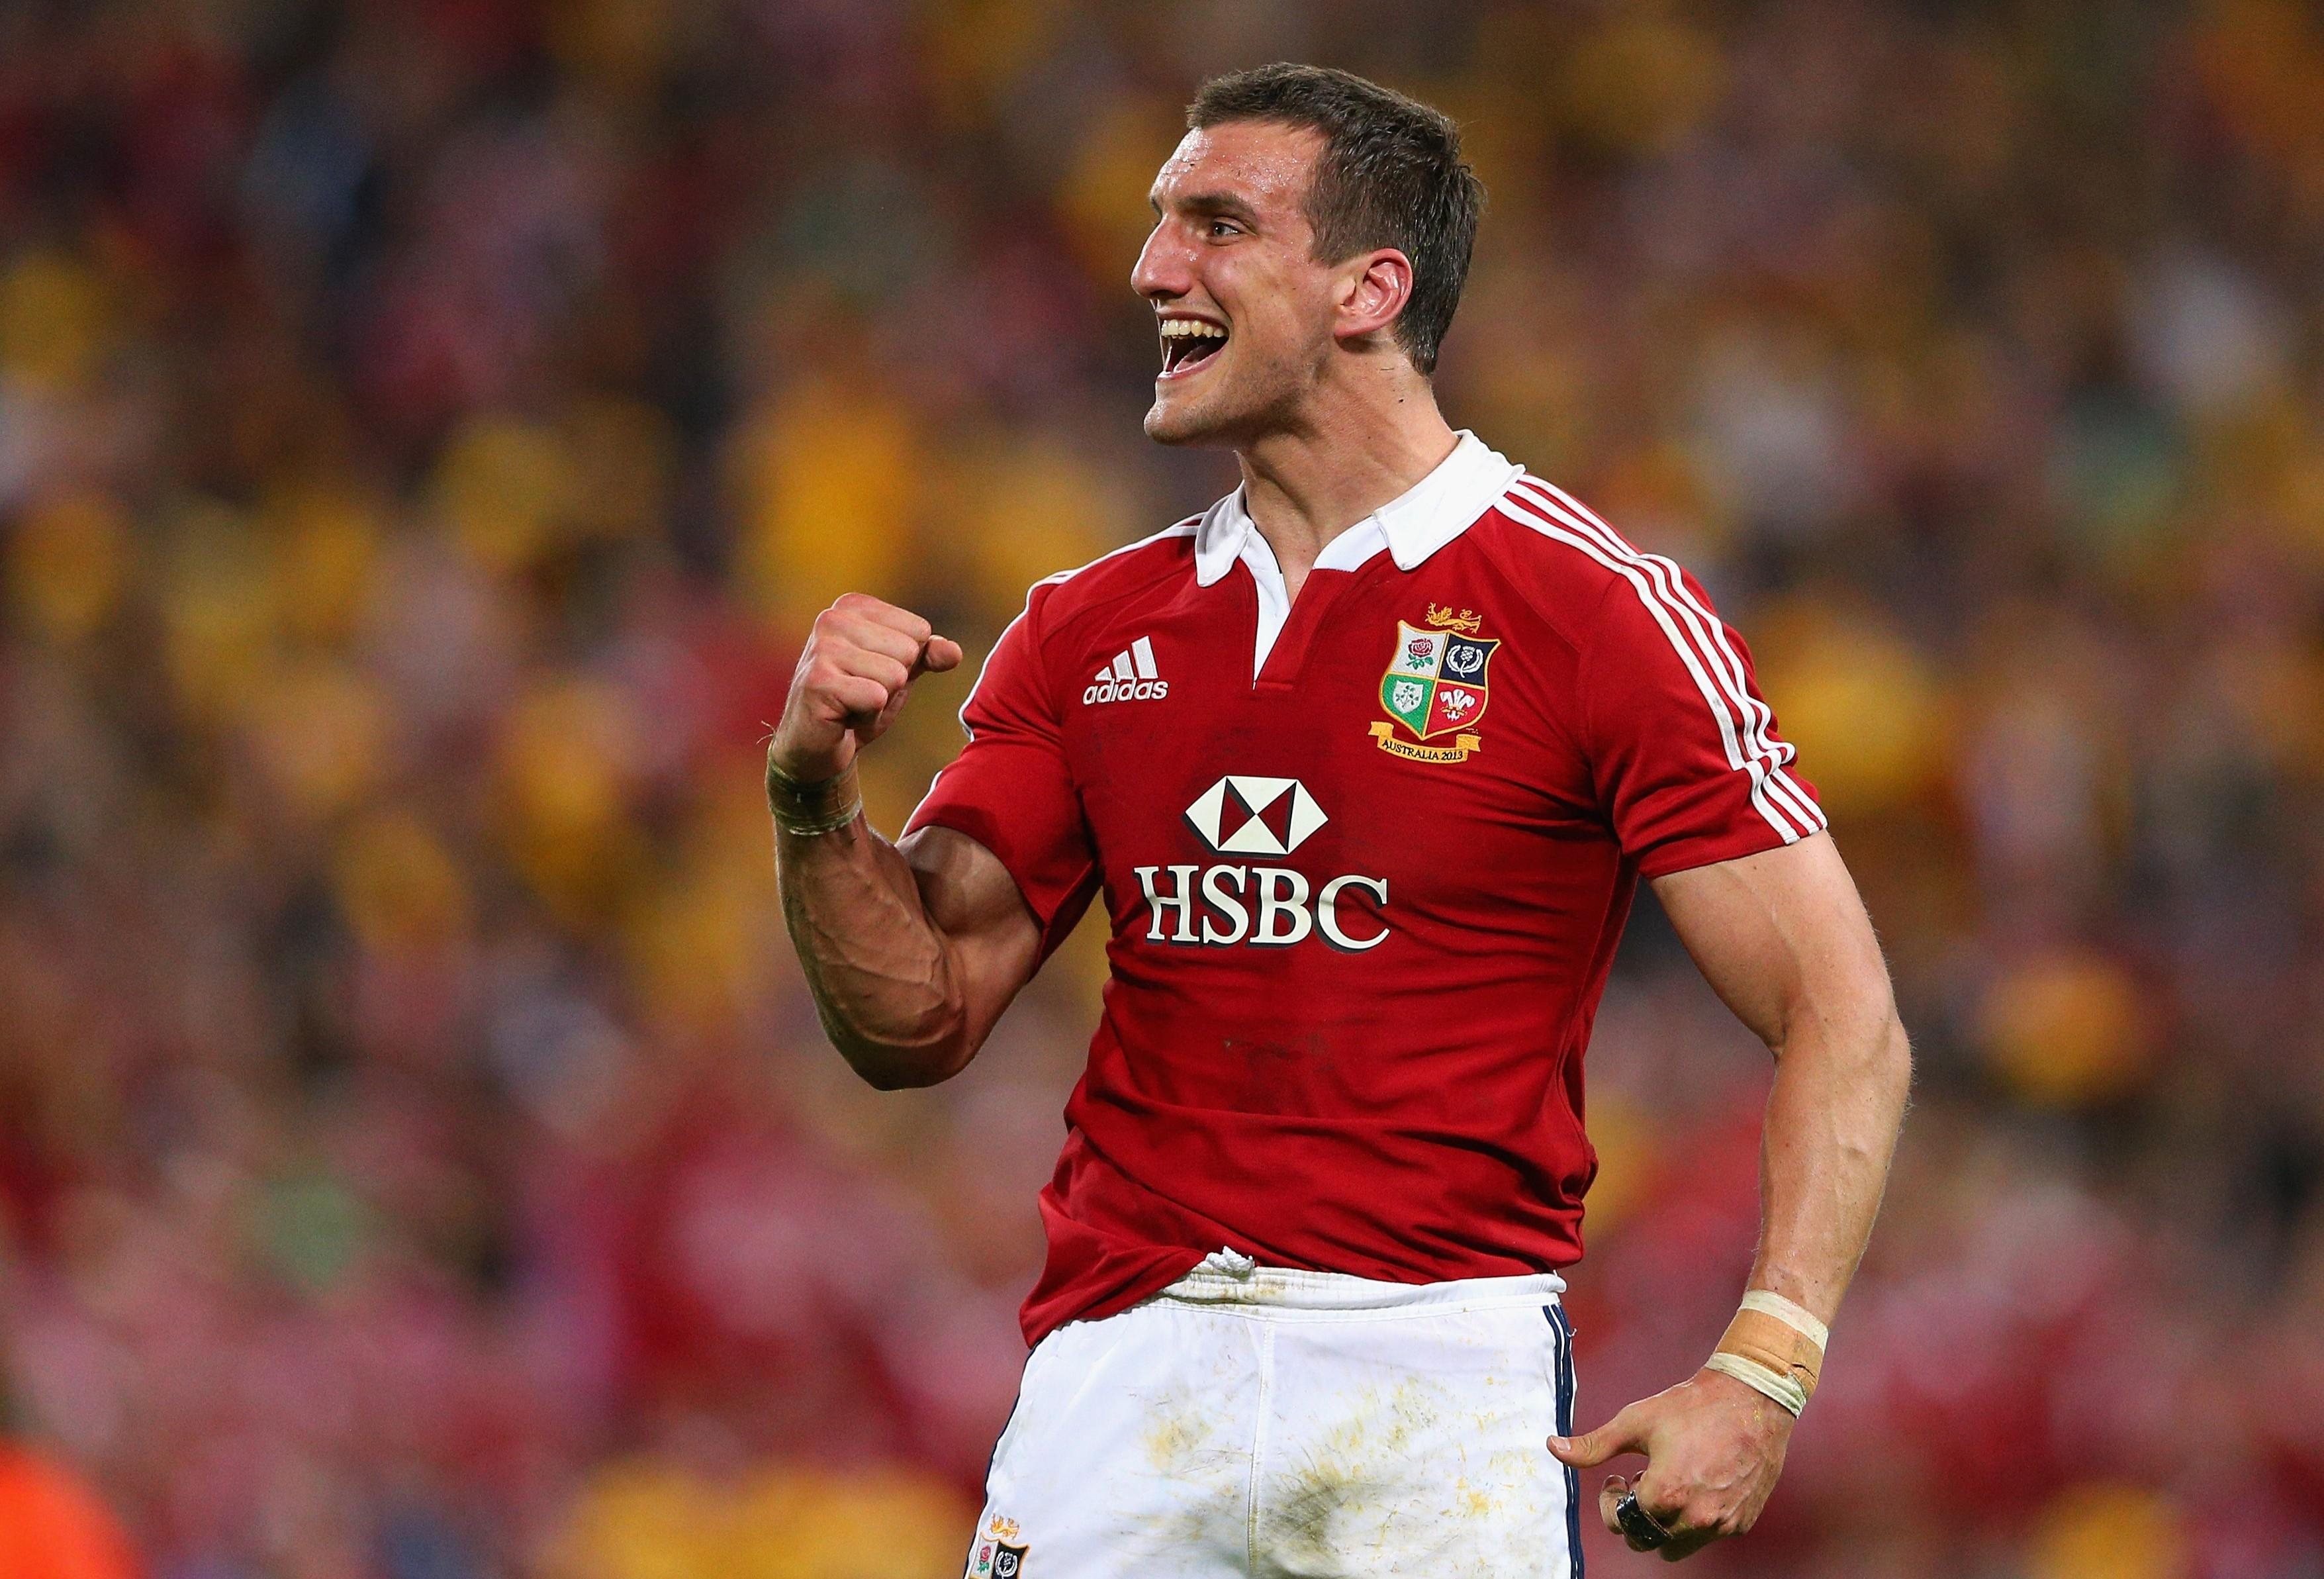 British and Irish Lions will go down in history, insists Sam Warburton